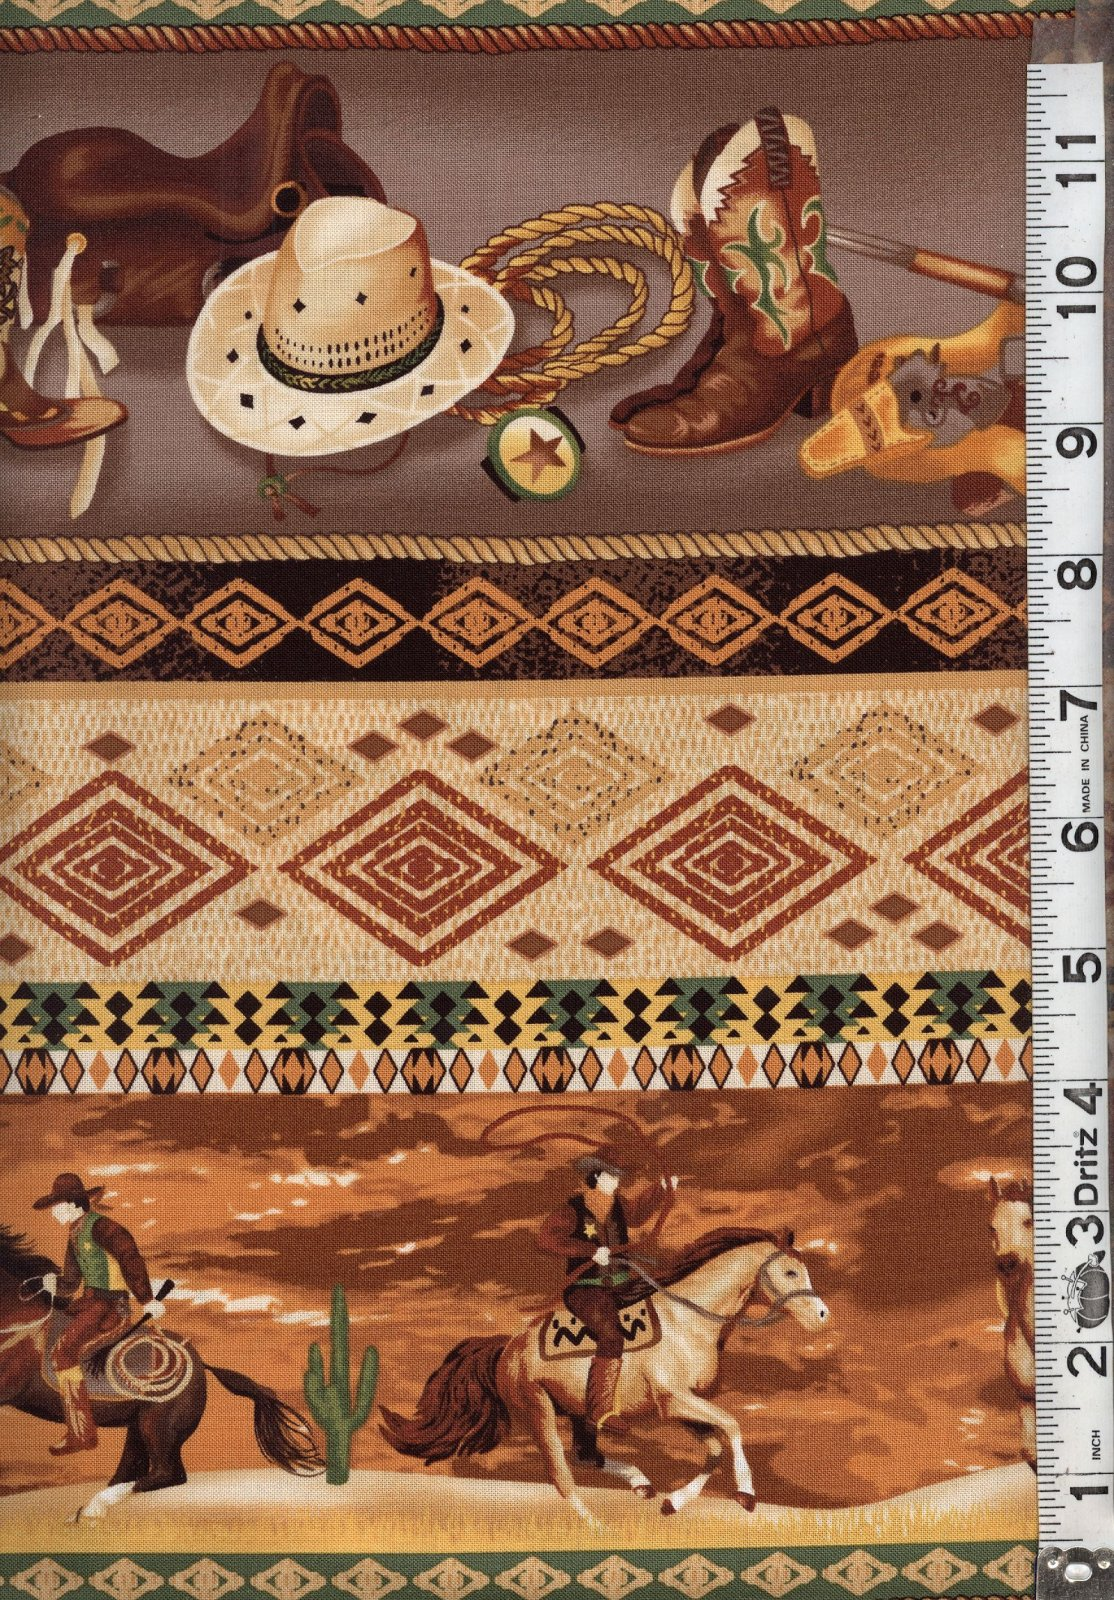 Roundup Cowboy Stripe by Fabri-Quilt 112-26401